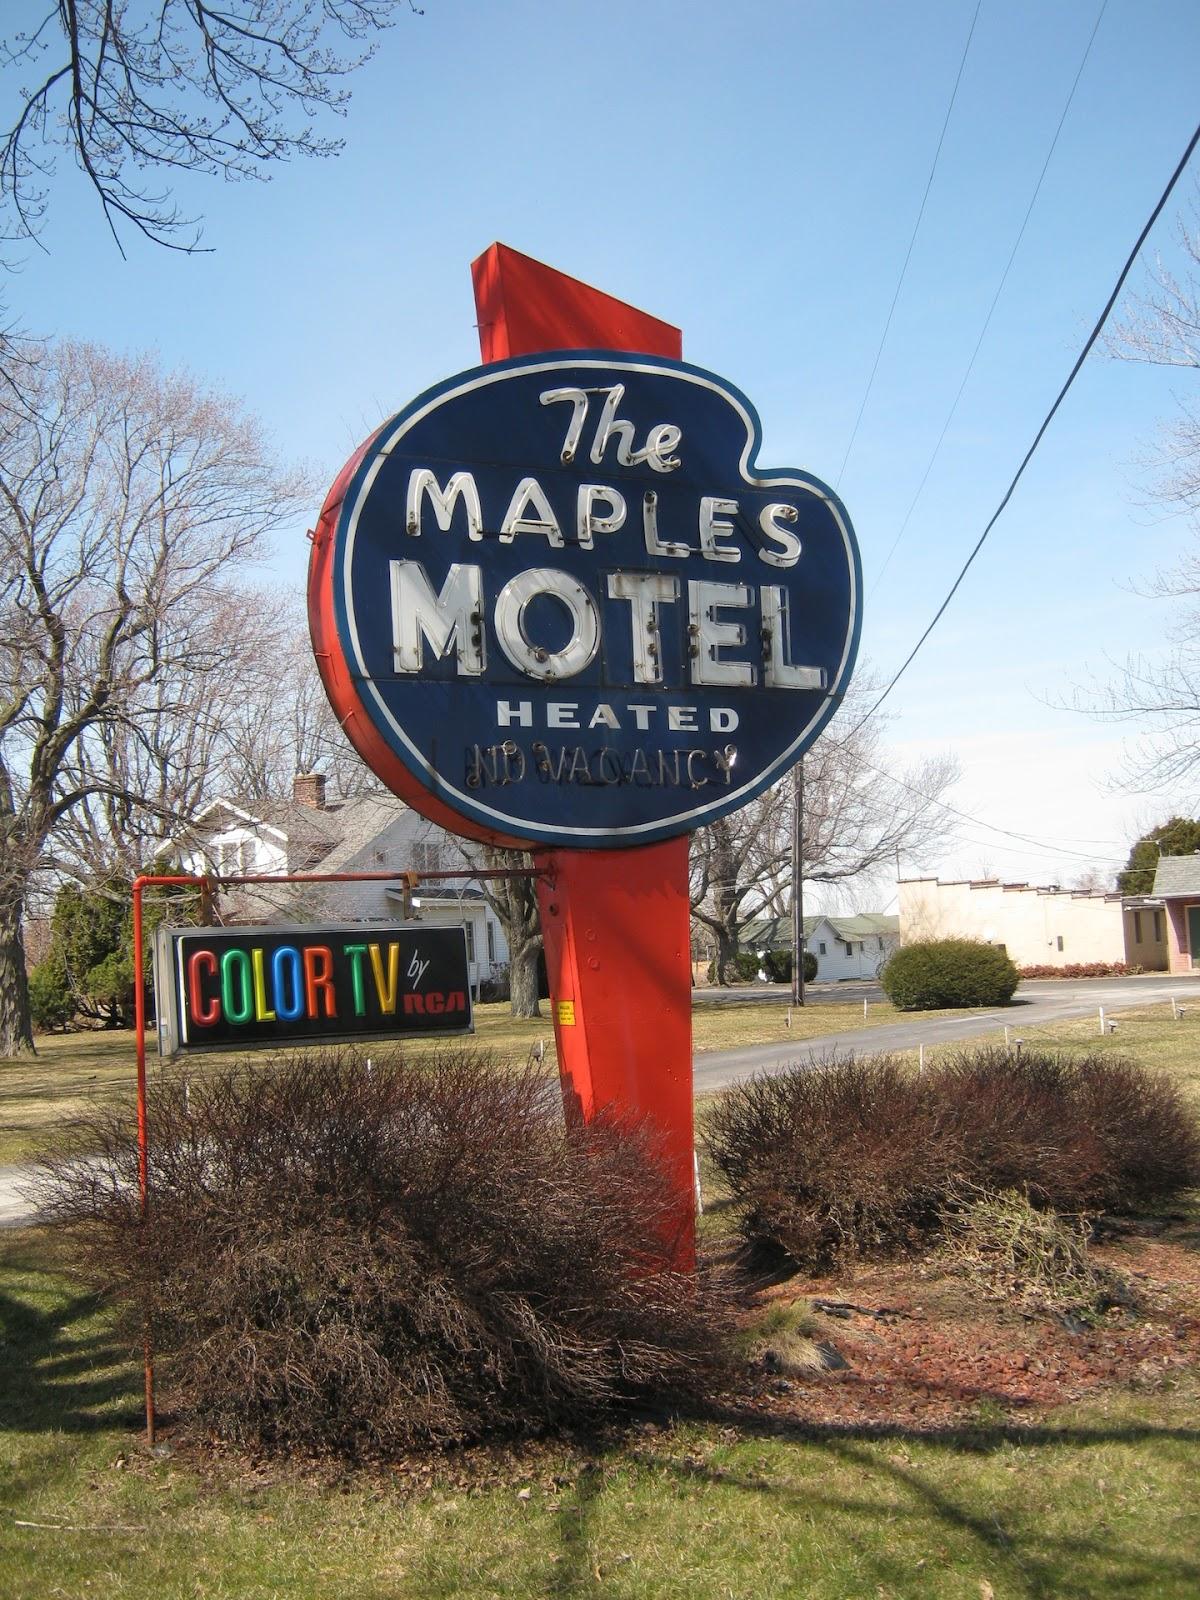 The Maples Motel - 4409 Cleveland Road West, Sandusky, Ohio U.S.A. - 2013